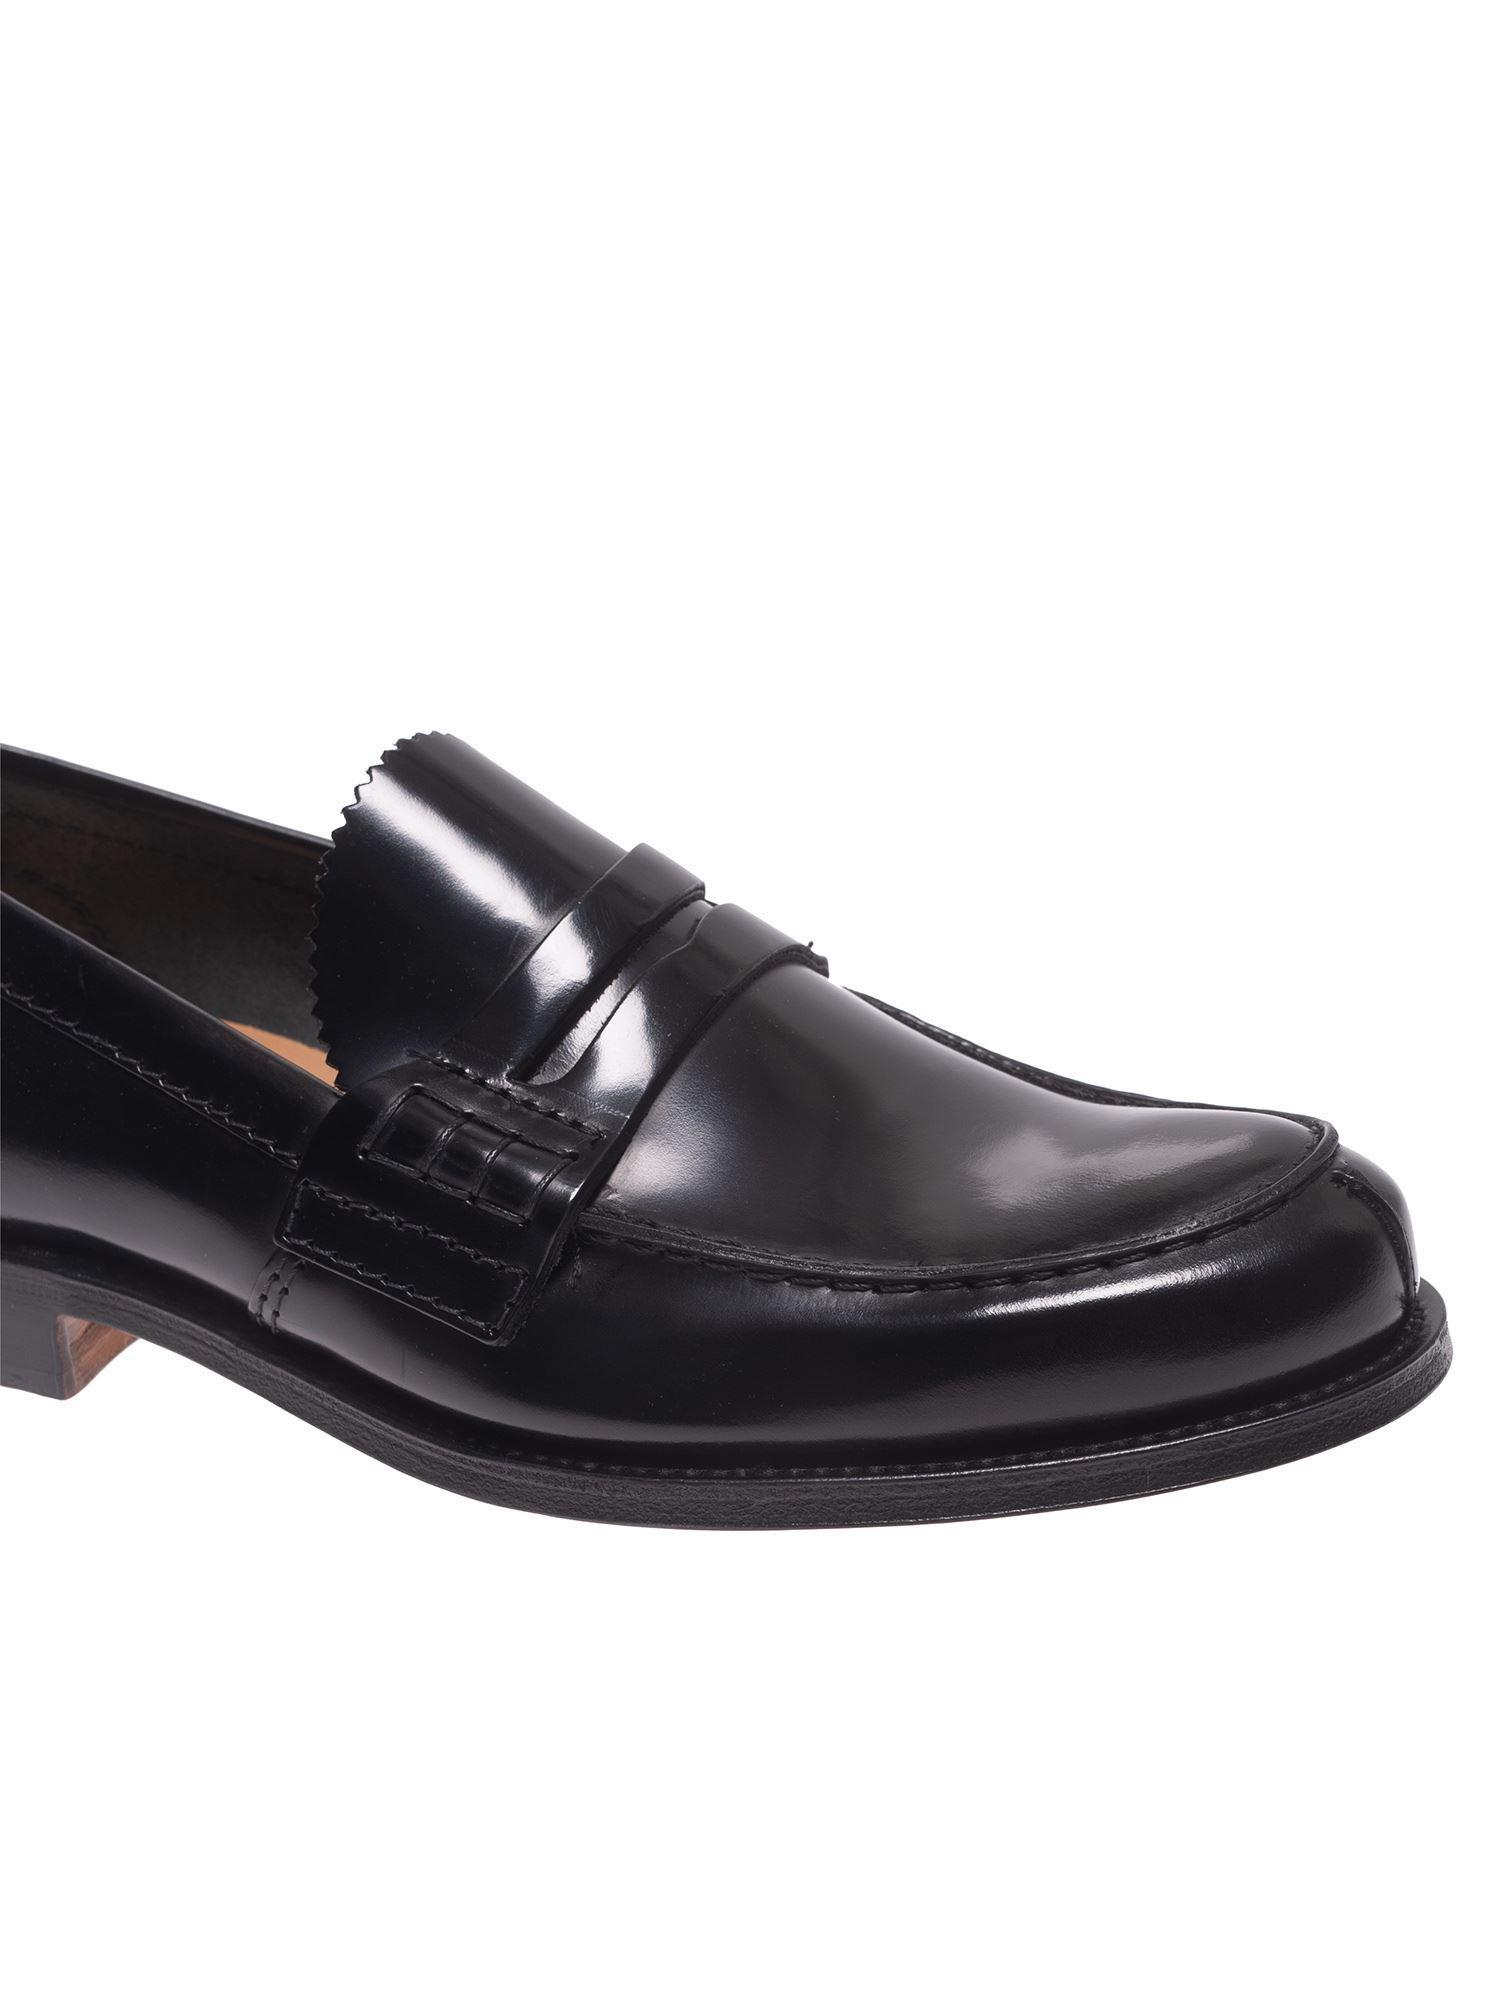 074a8cb79df Church s - Tunbridge Loafers In Black for Men - Lyst. View fullscreen